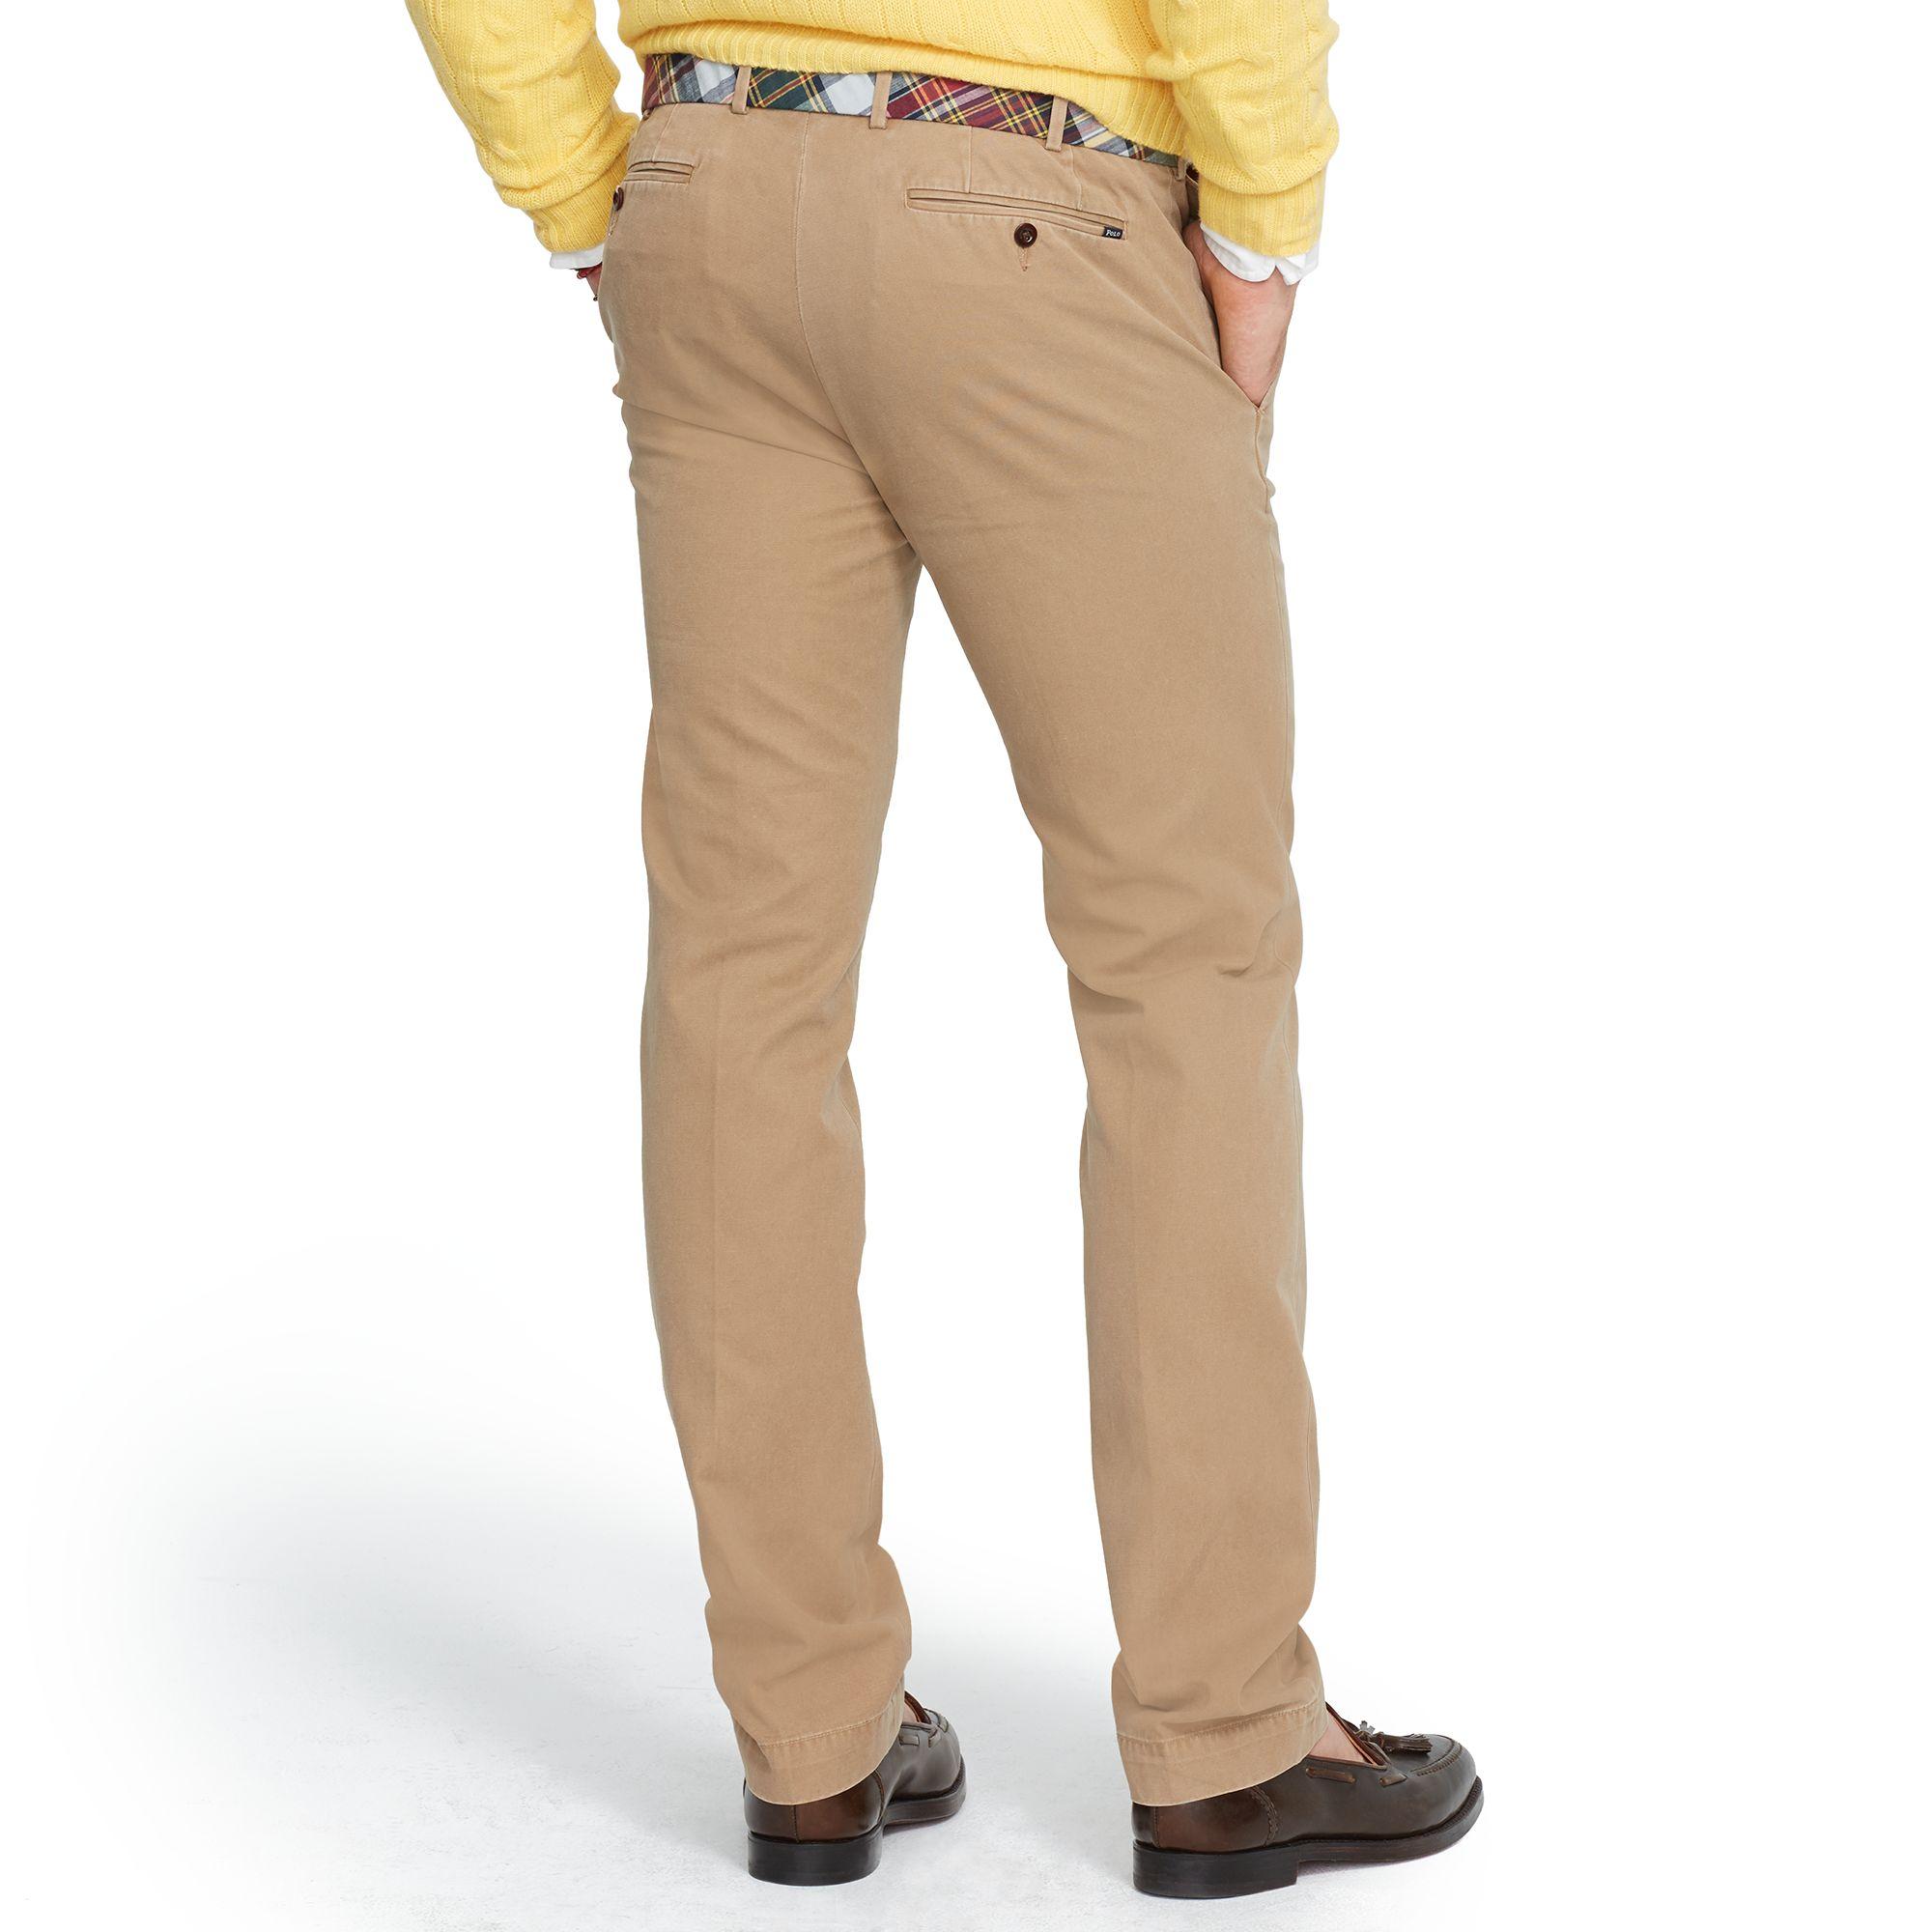 ec0f8fa7288e Polo Ralph Lauren Slim-Fit Lightweight Chino in Brown for Men - Lyst